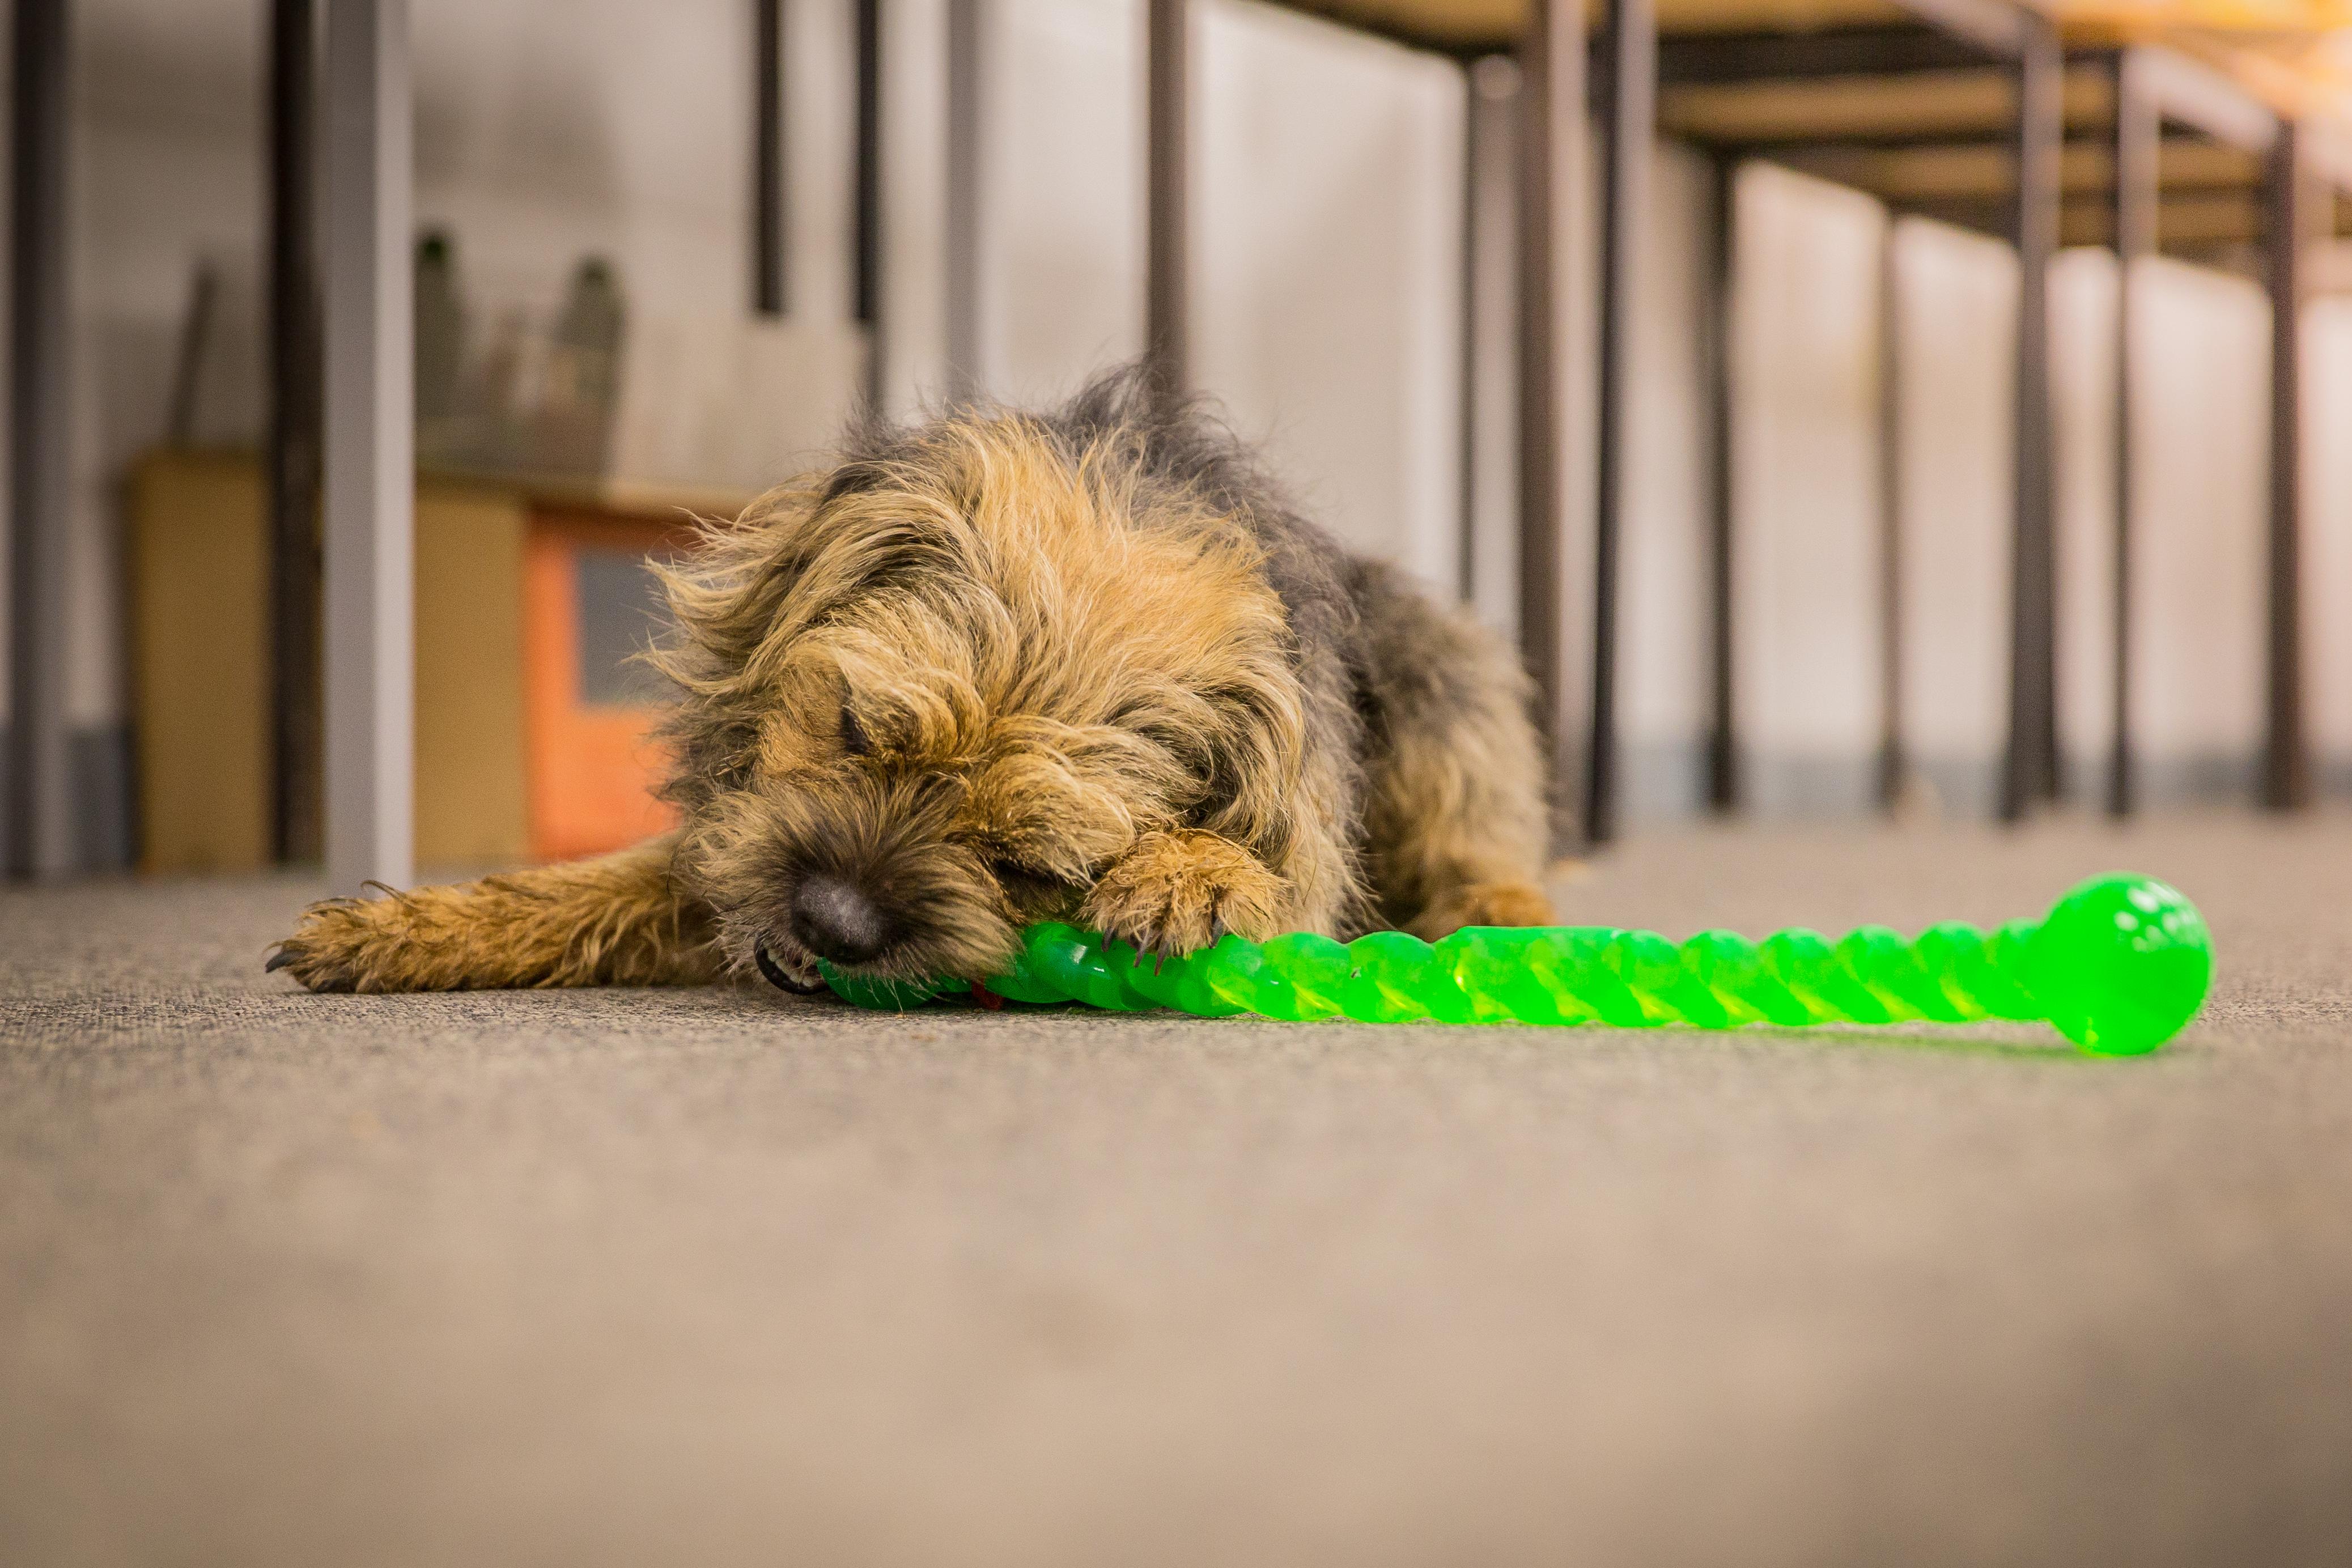 dogs in schools